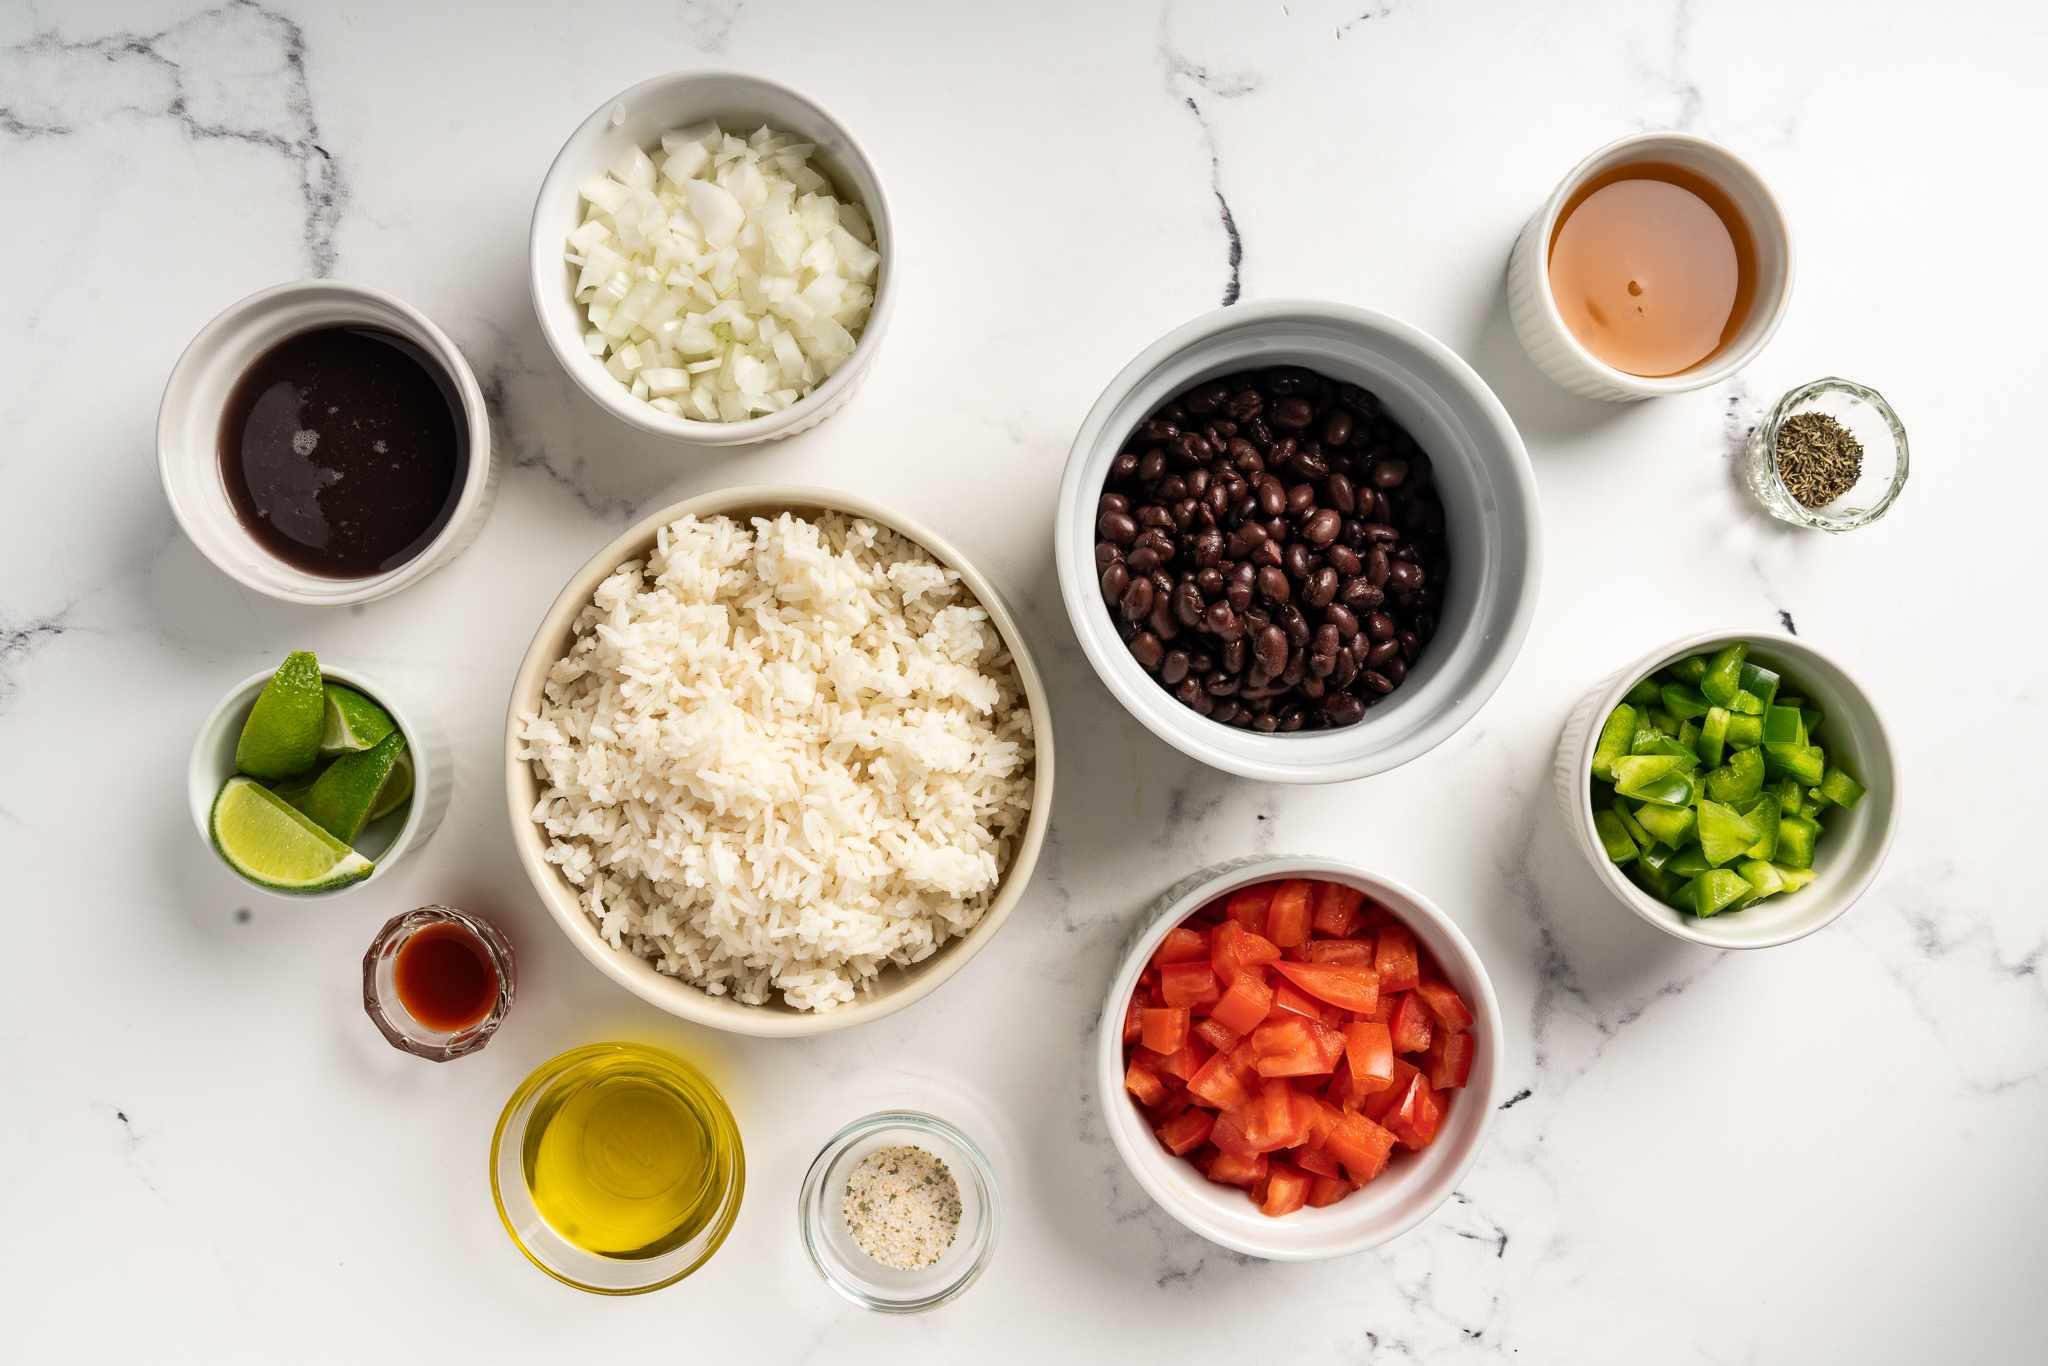 Basic Vegetarian Black Beans and Rice ingredients